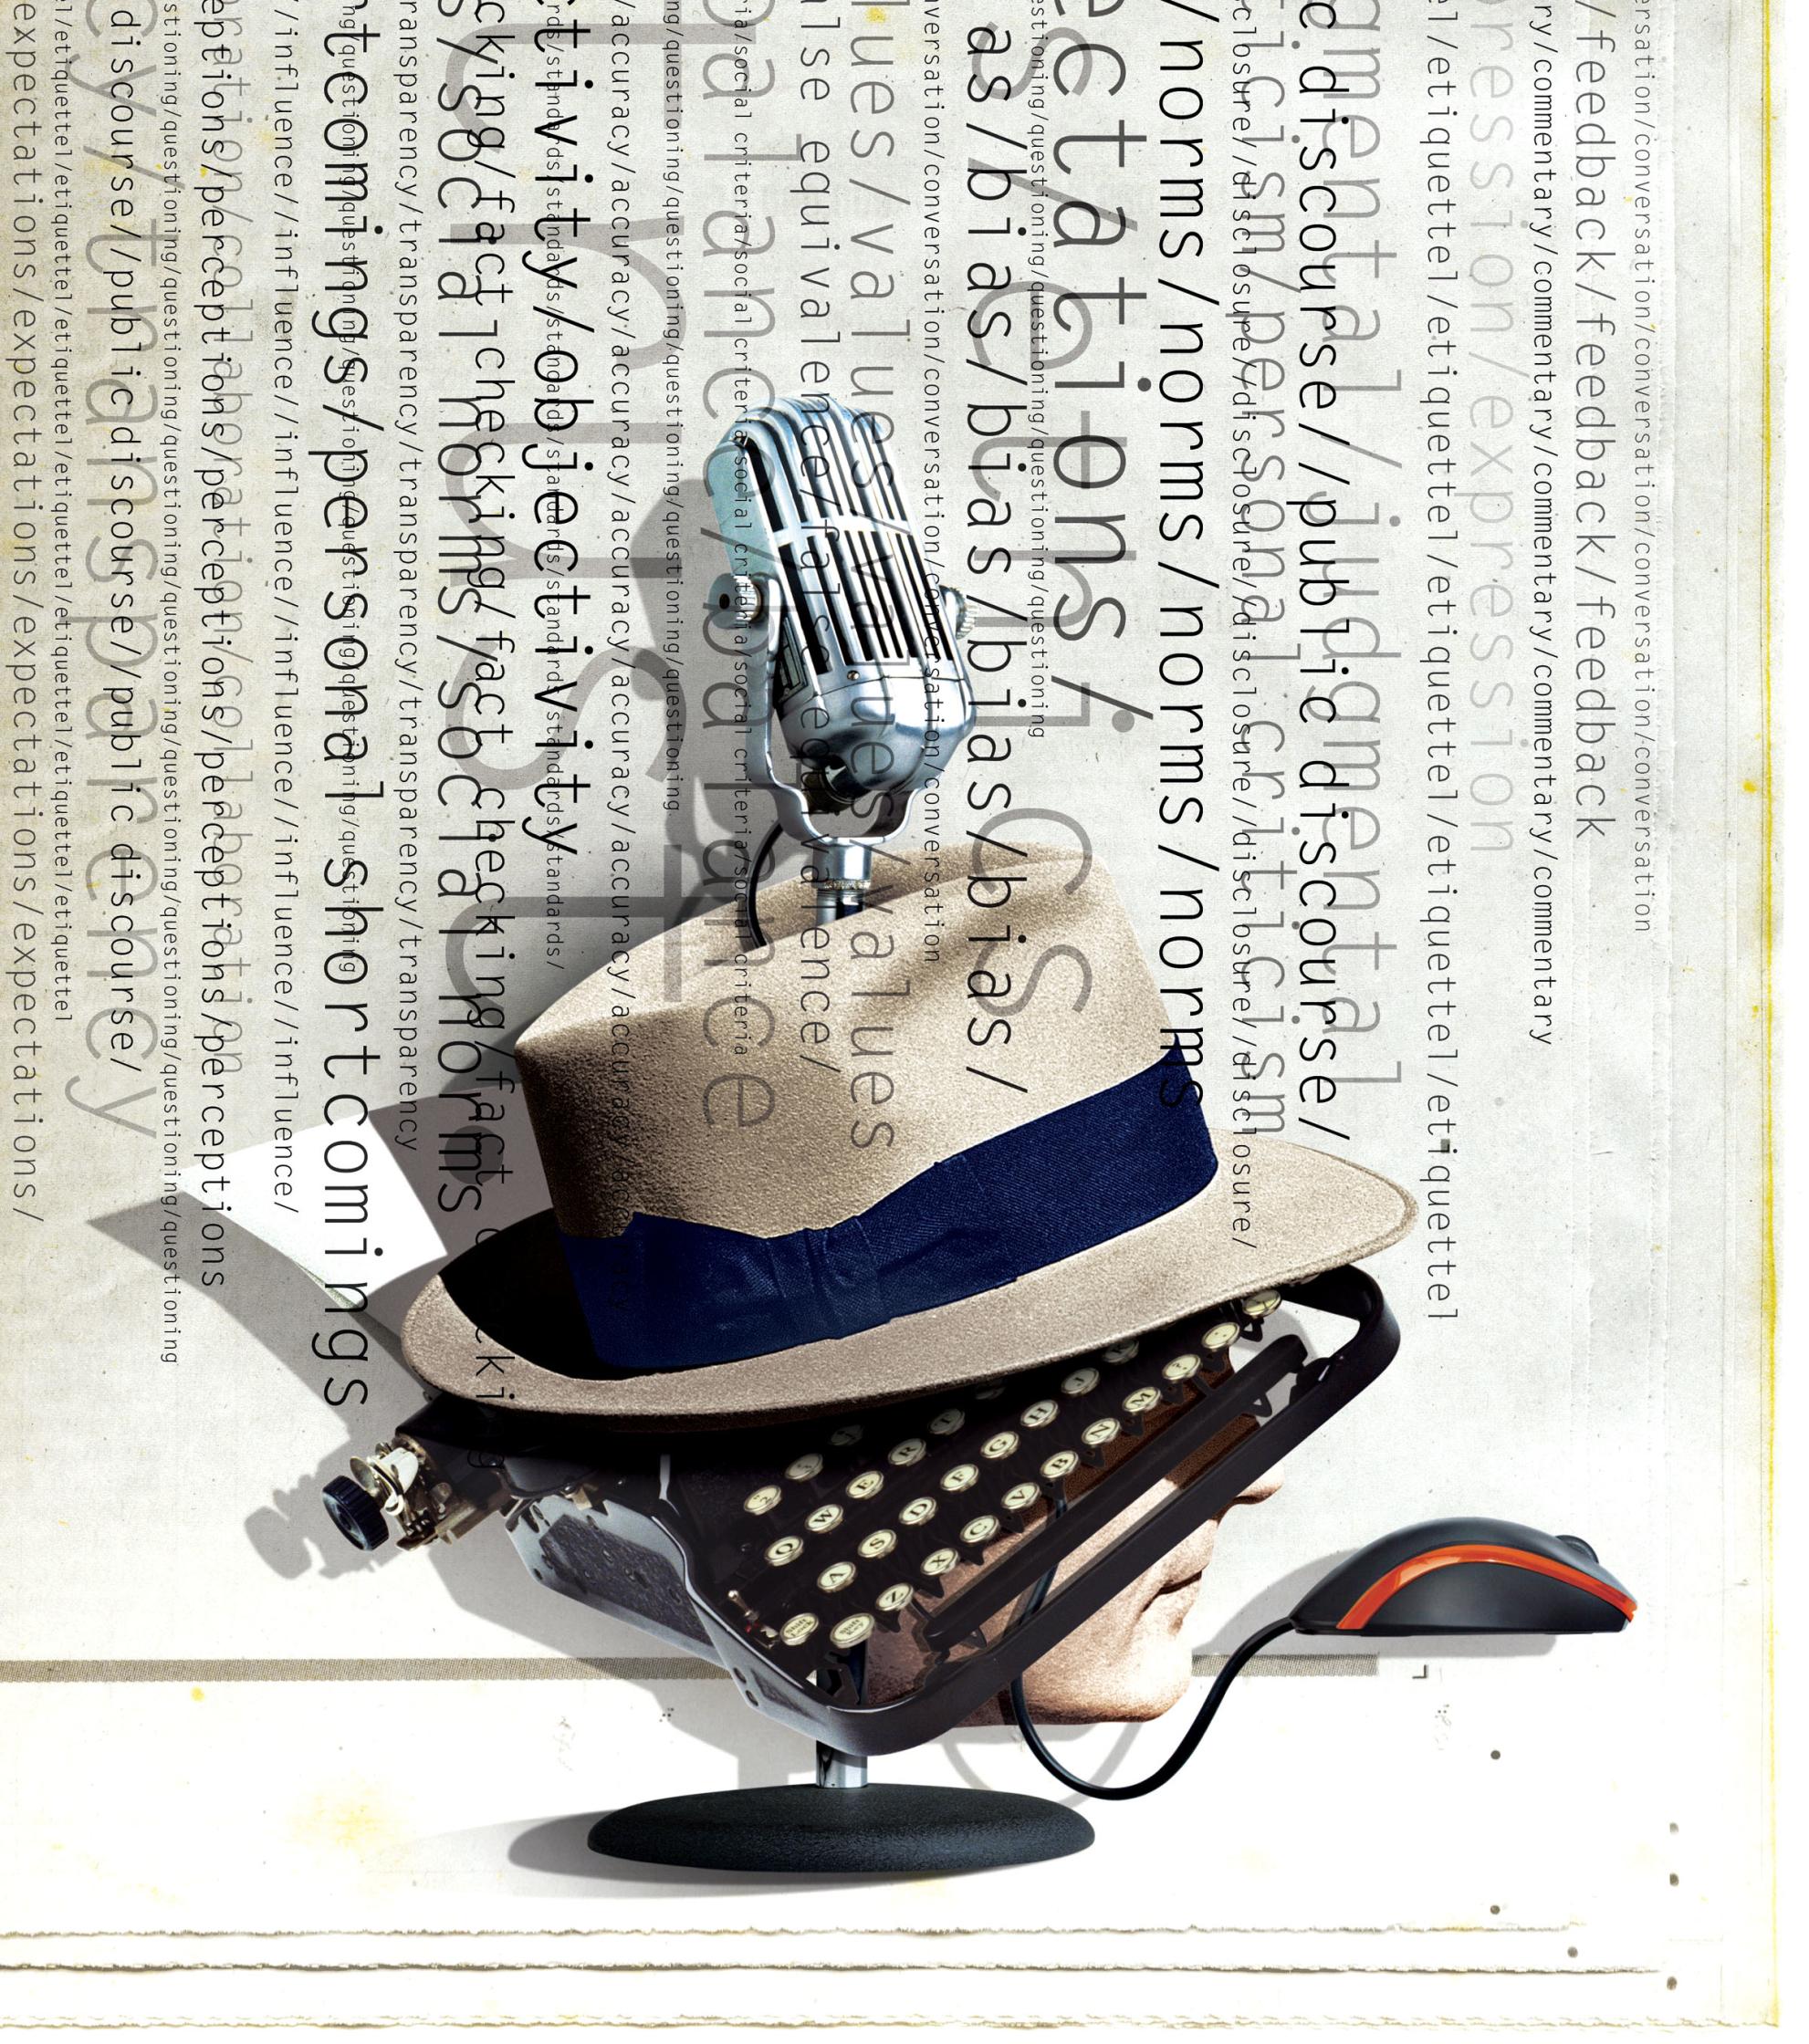 Digital Comments 1 - Illuminations magazine.jpg